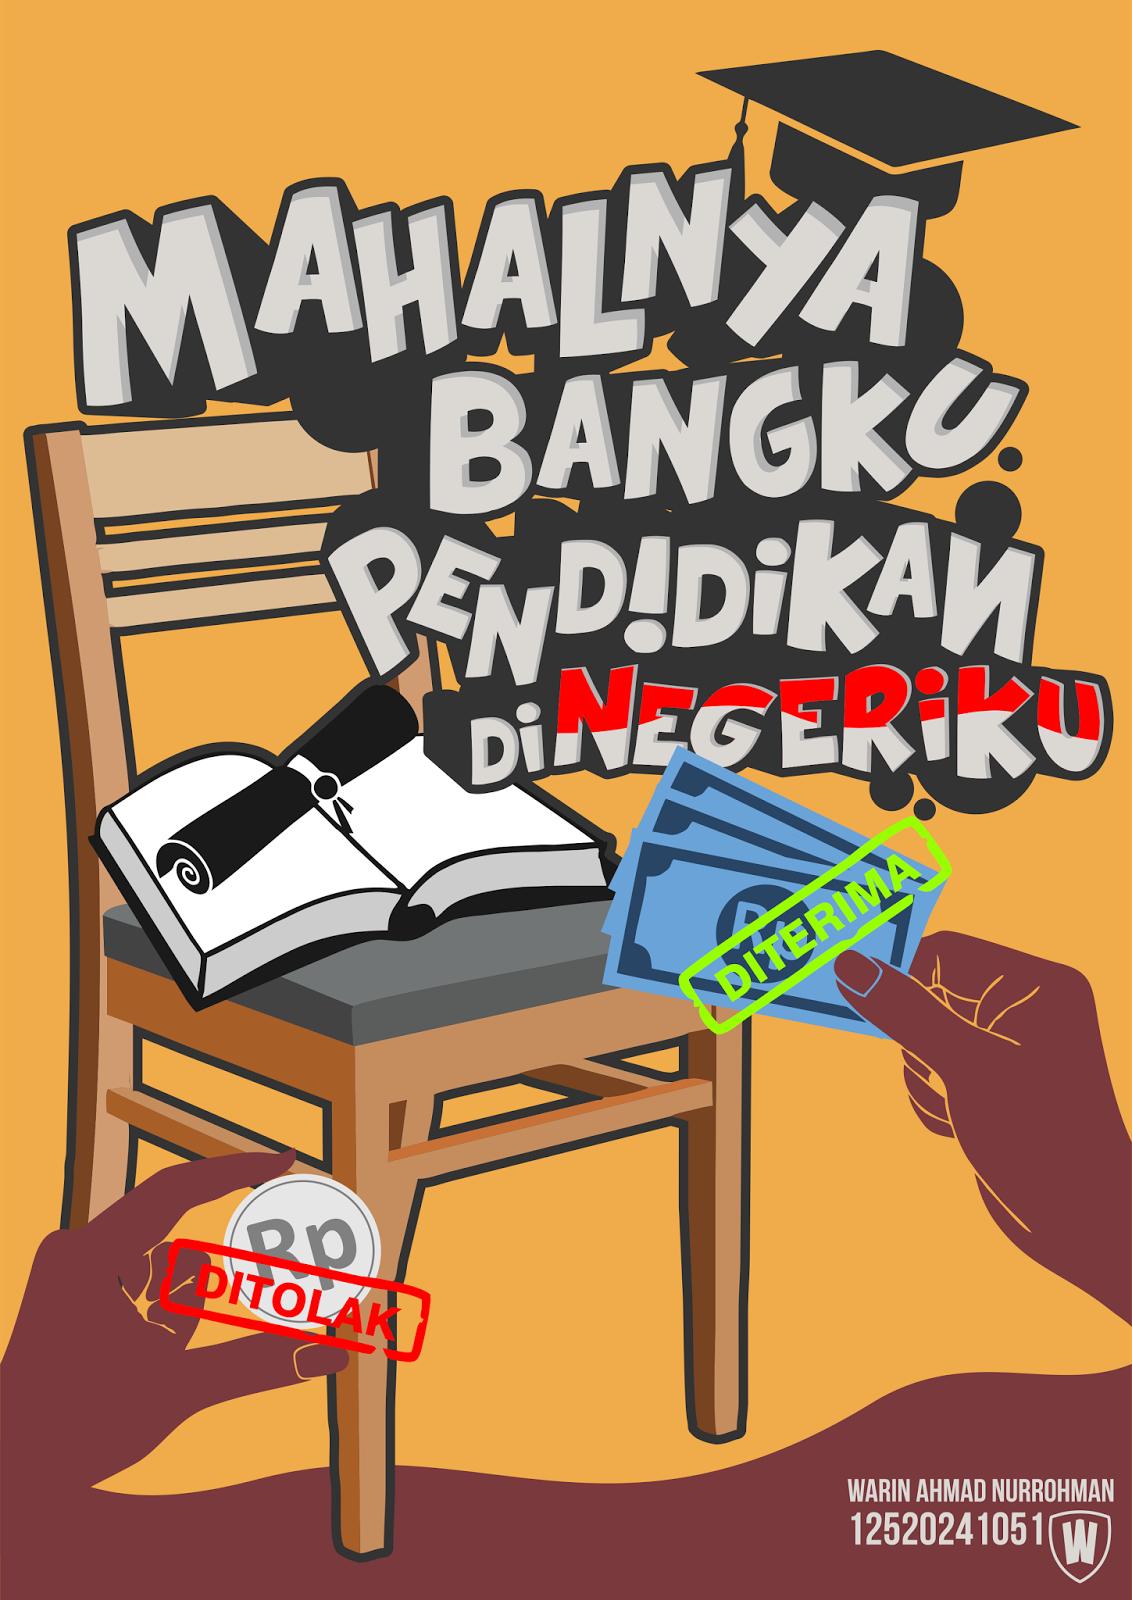 Puisi Tentang Kelas Sma Pilularia Globulifera Silabus Biologi Sma Kelas X Poster Pendidikan Tumbilung